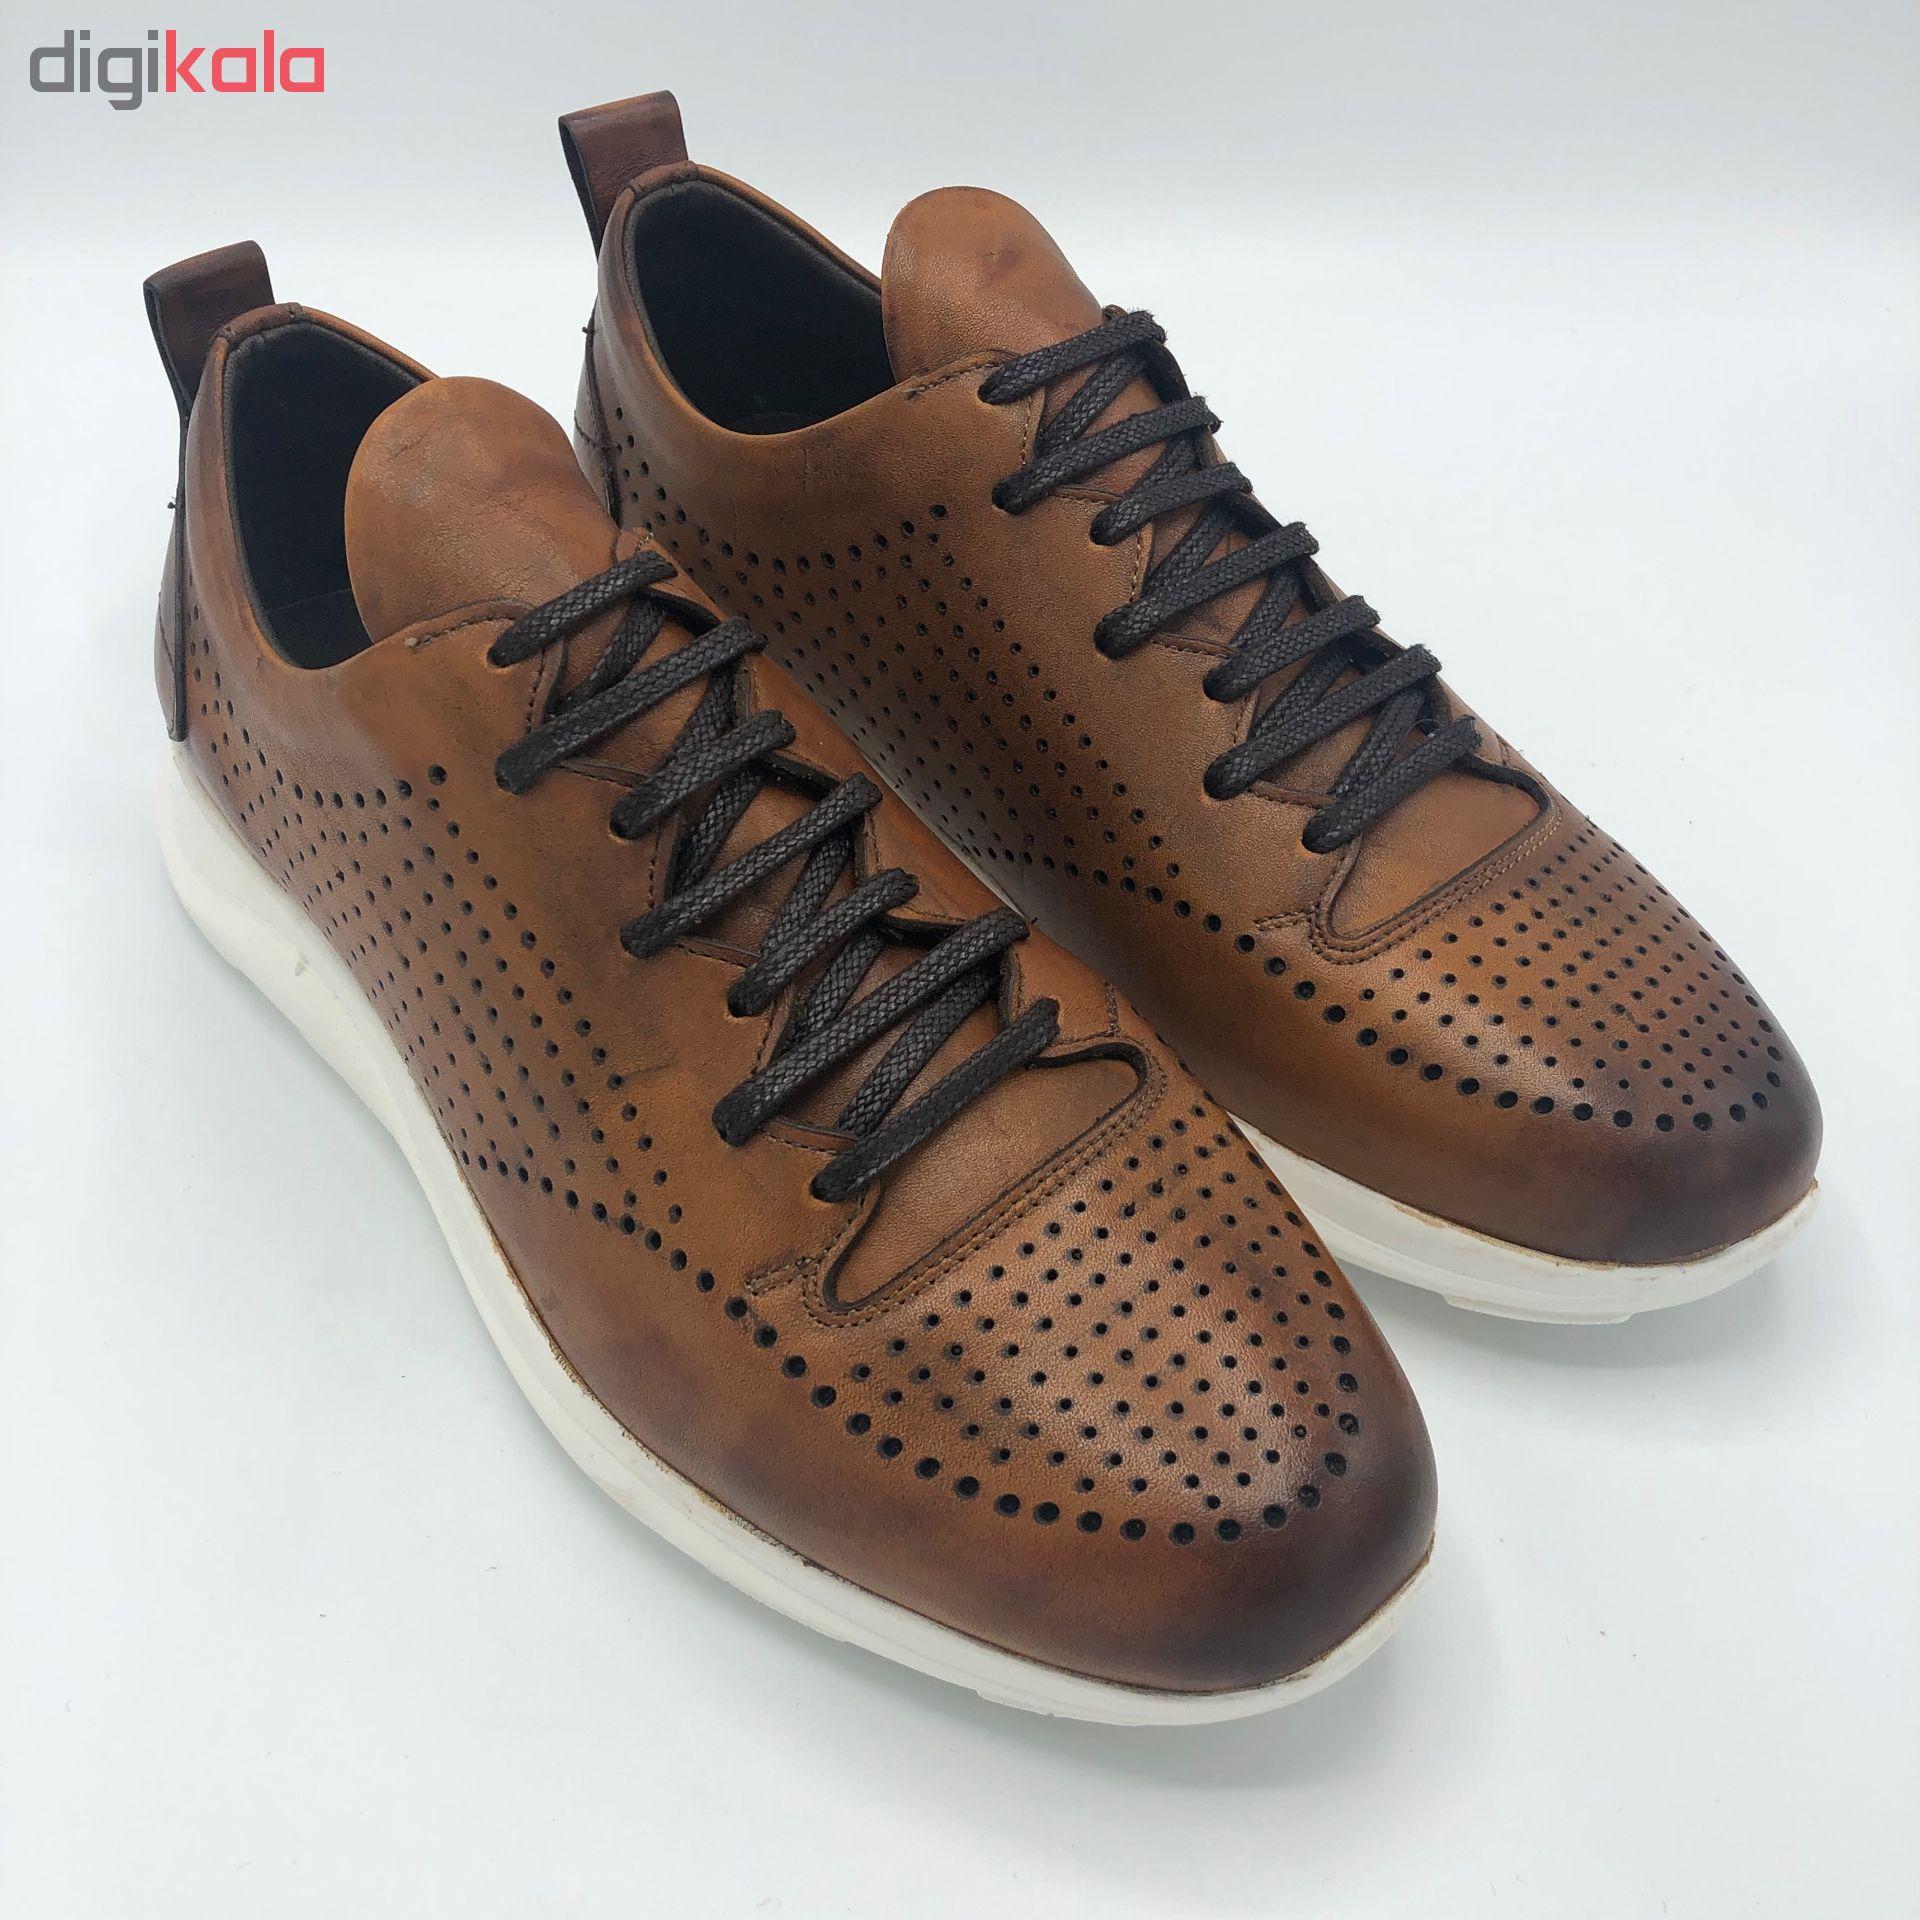 قیمت خرید کفش روزمره مردانه کد 500 اورجینال